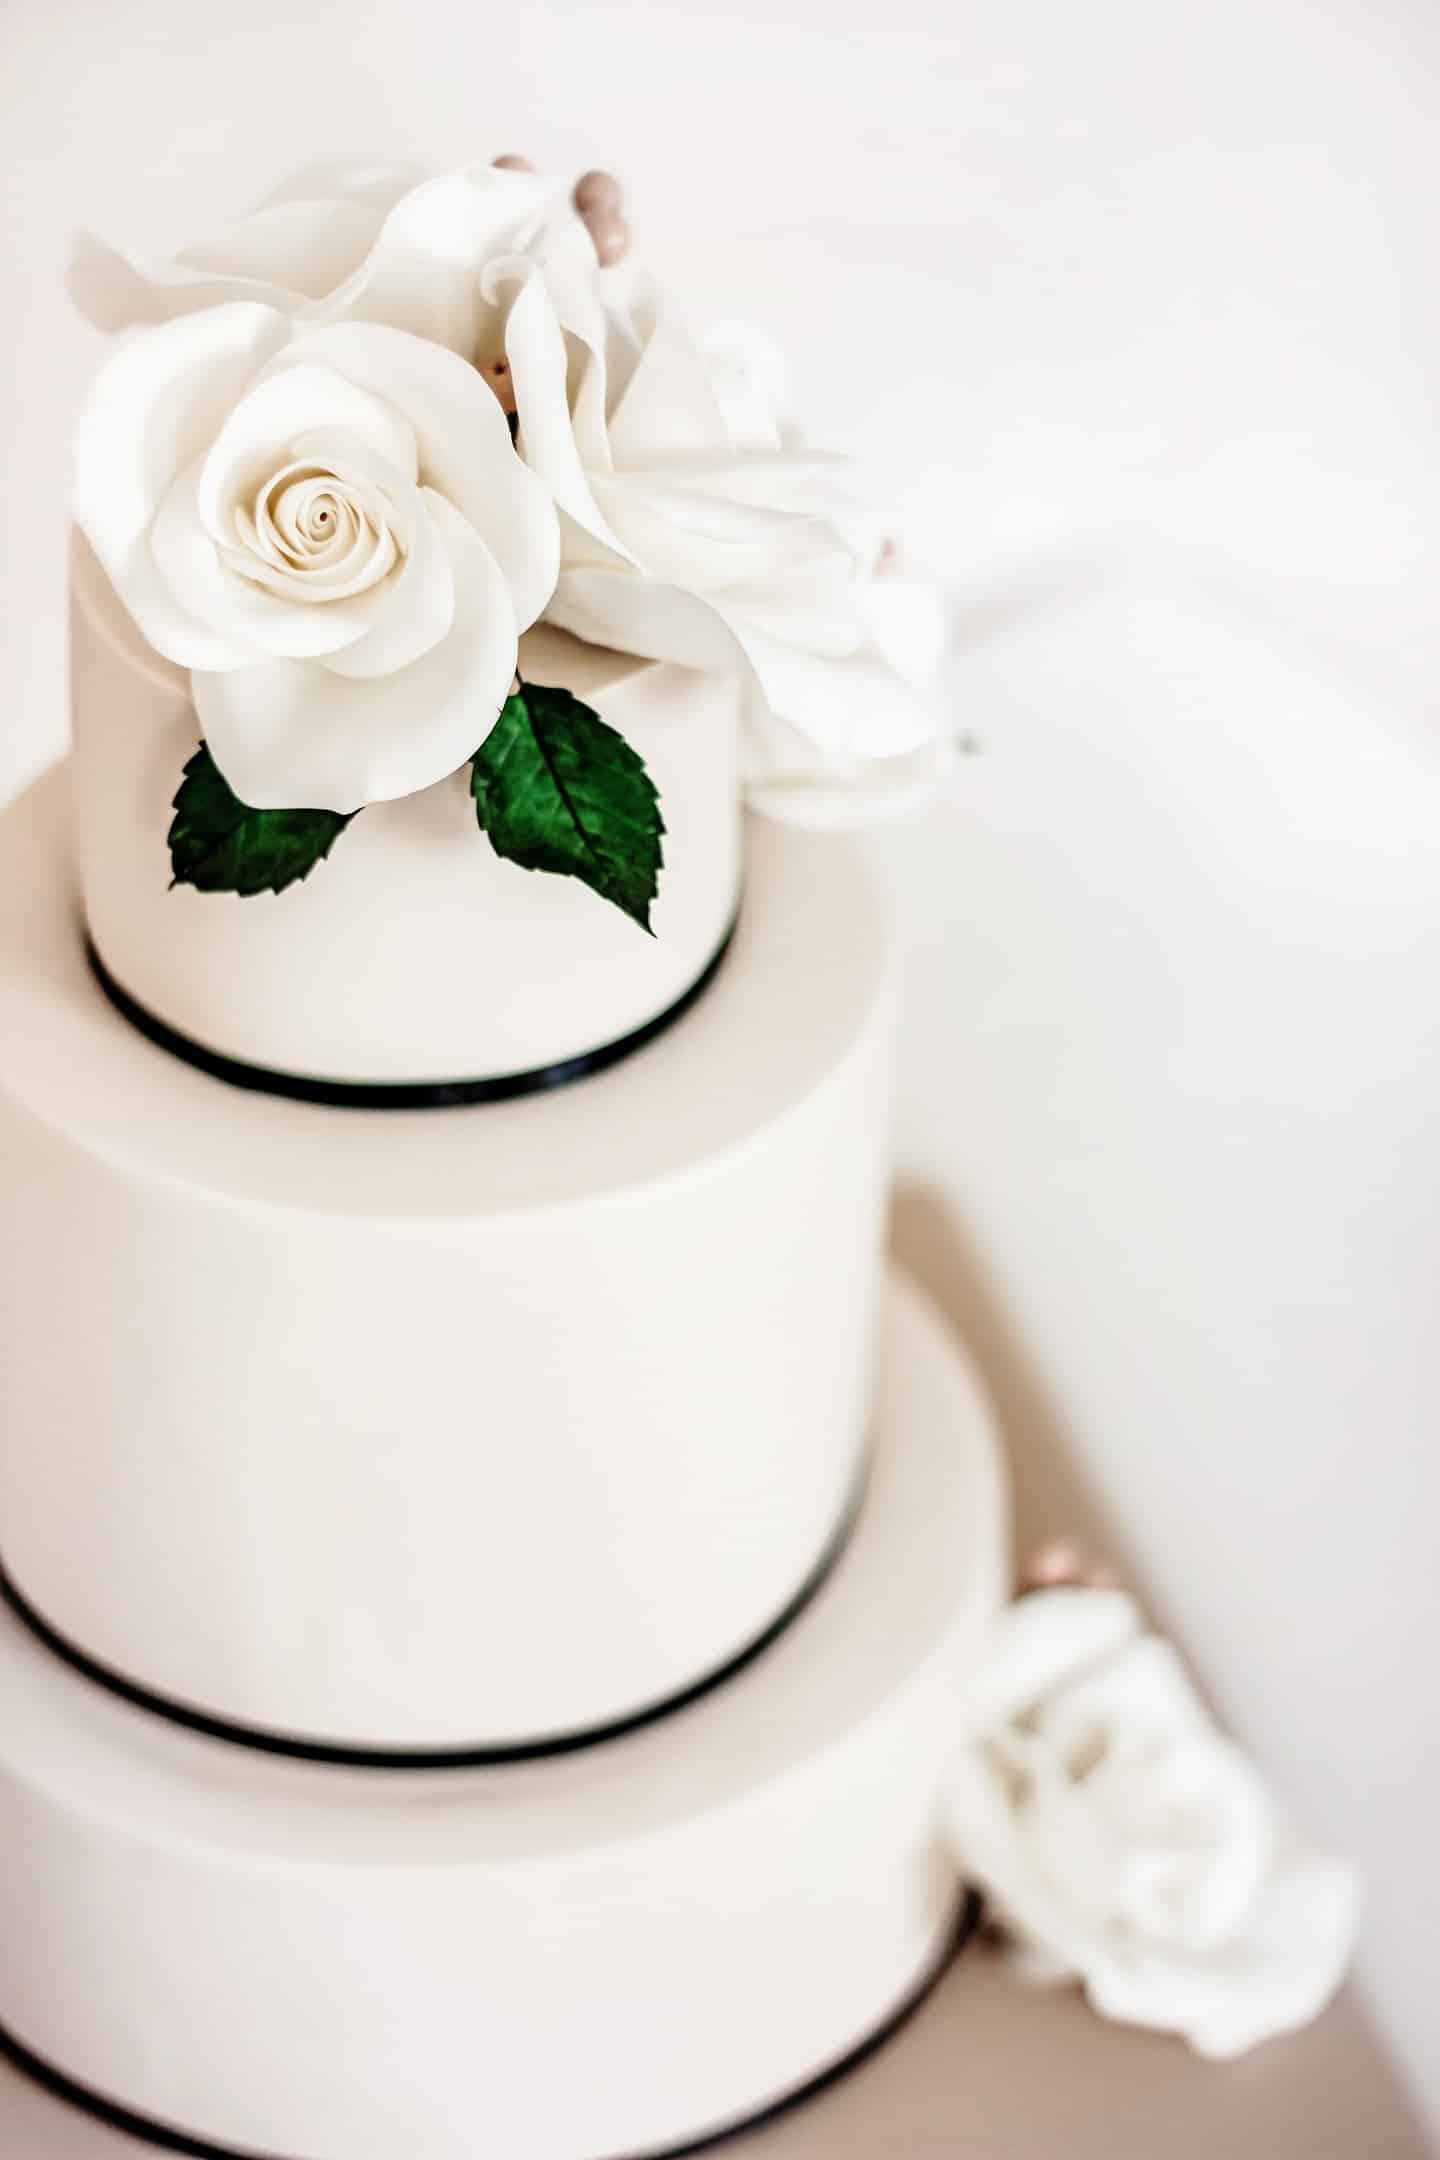 Perfect chocolate ganache cake for wedding cakes